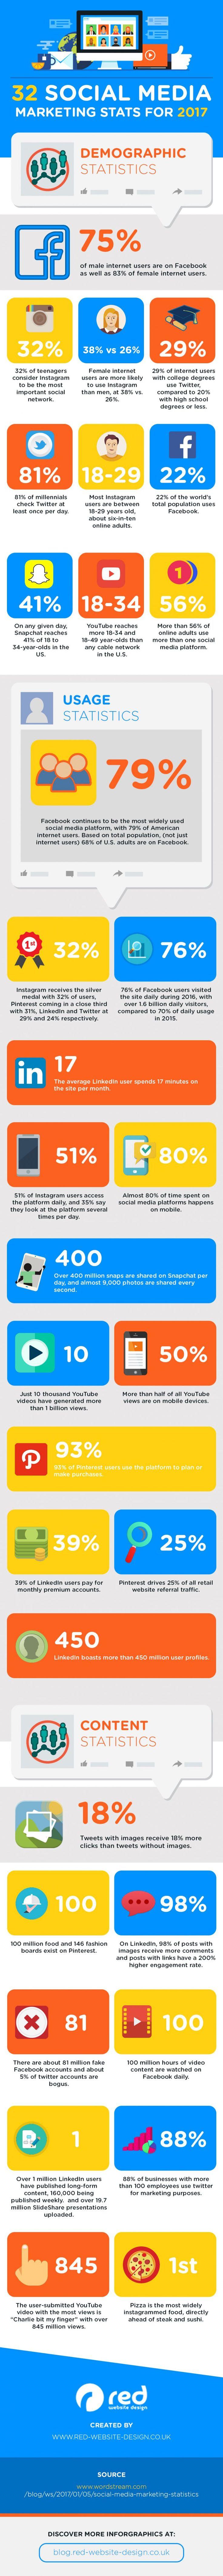 32 interessante feiten en cijfers over social media #infographic #socialmedia